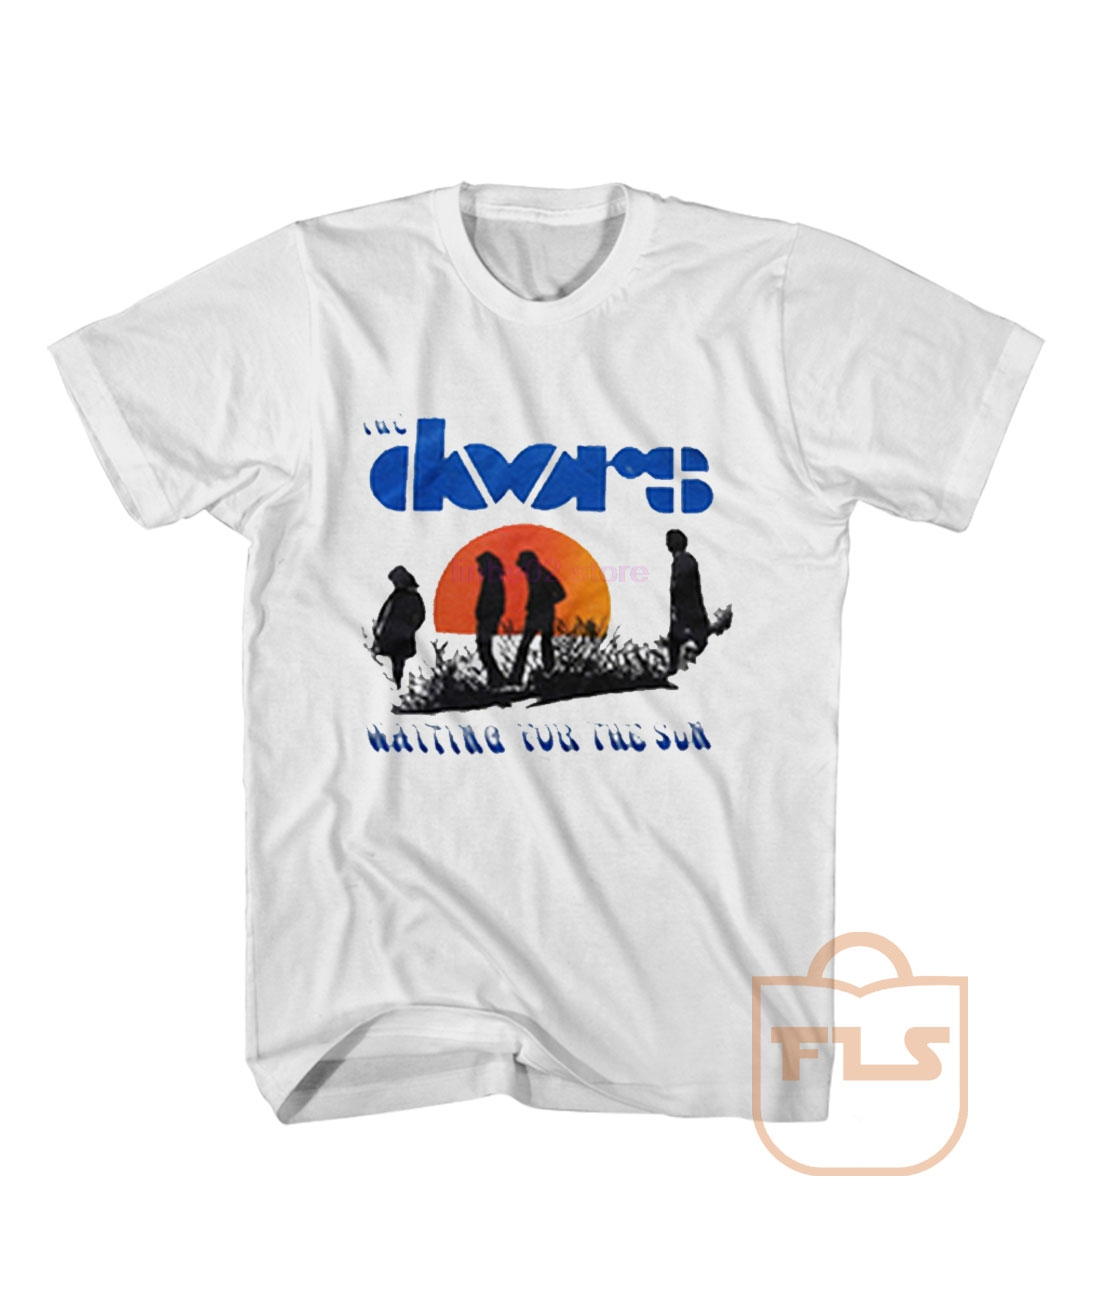 Phiking Doors Waiting For The Sun T Shirt Men's 2020 Summer Style Brand Apparel Casual Men's T-shirt